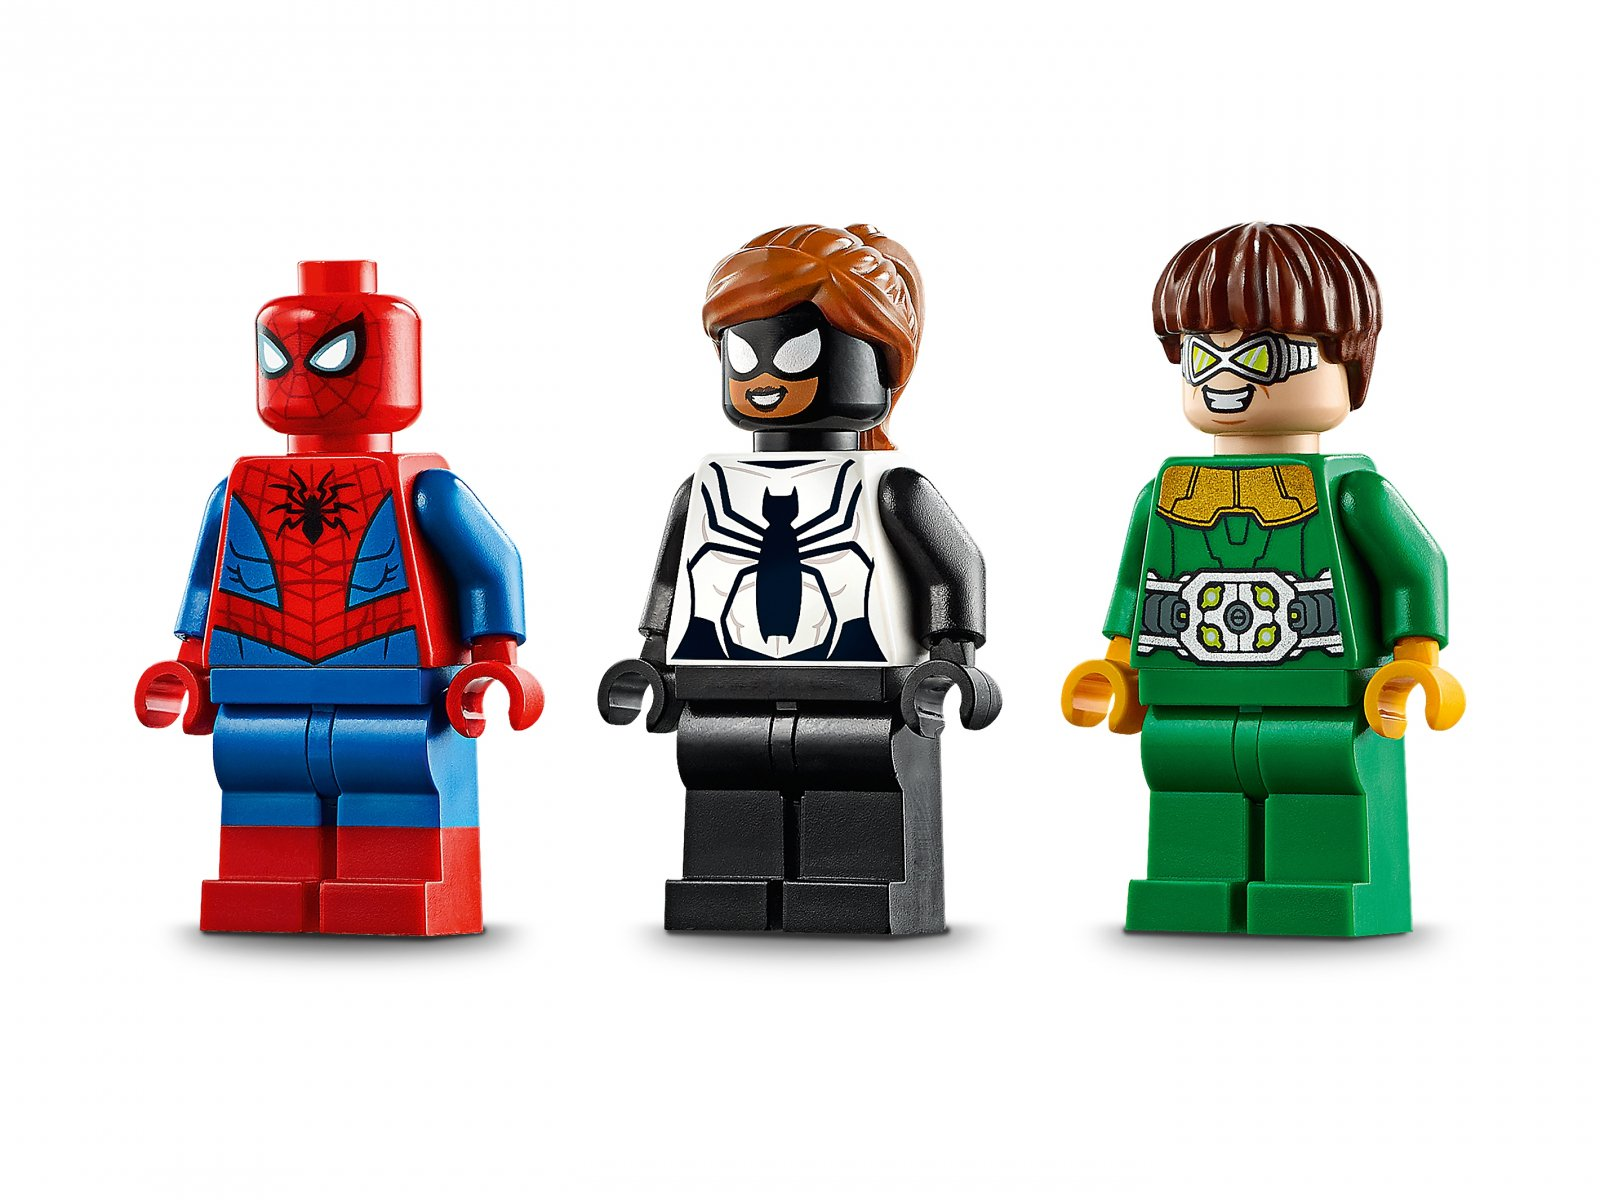 LEGO 76148 Spider-Man kontra Doc Ock